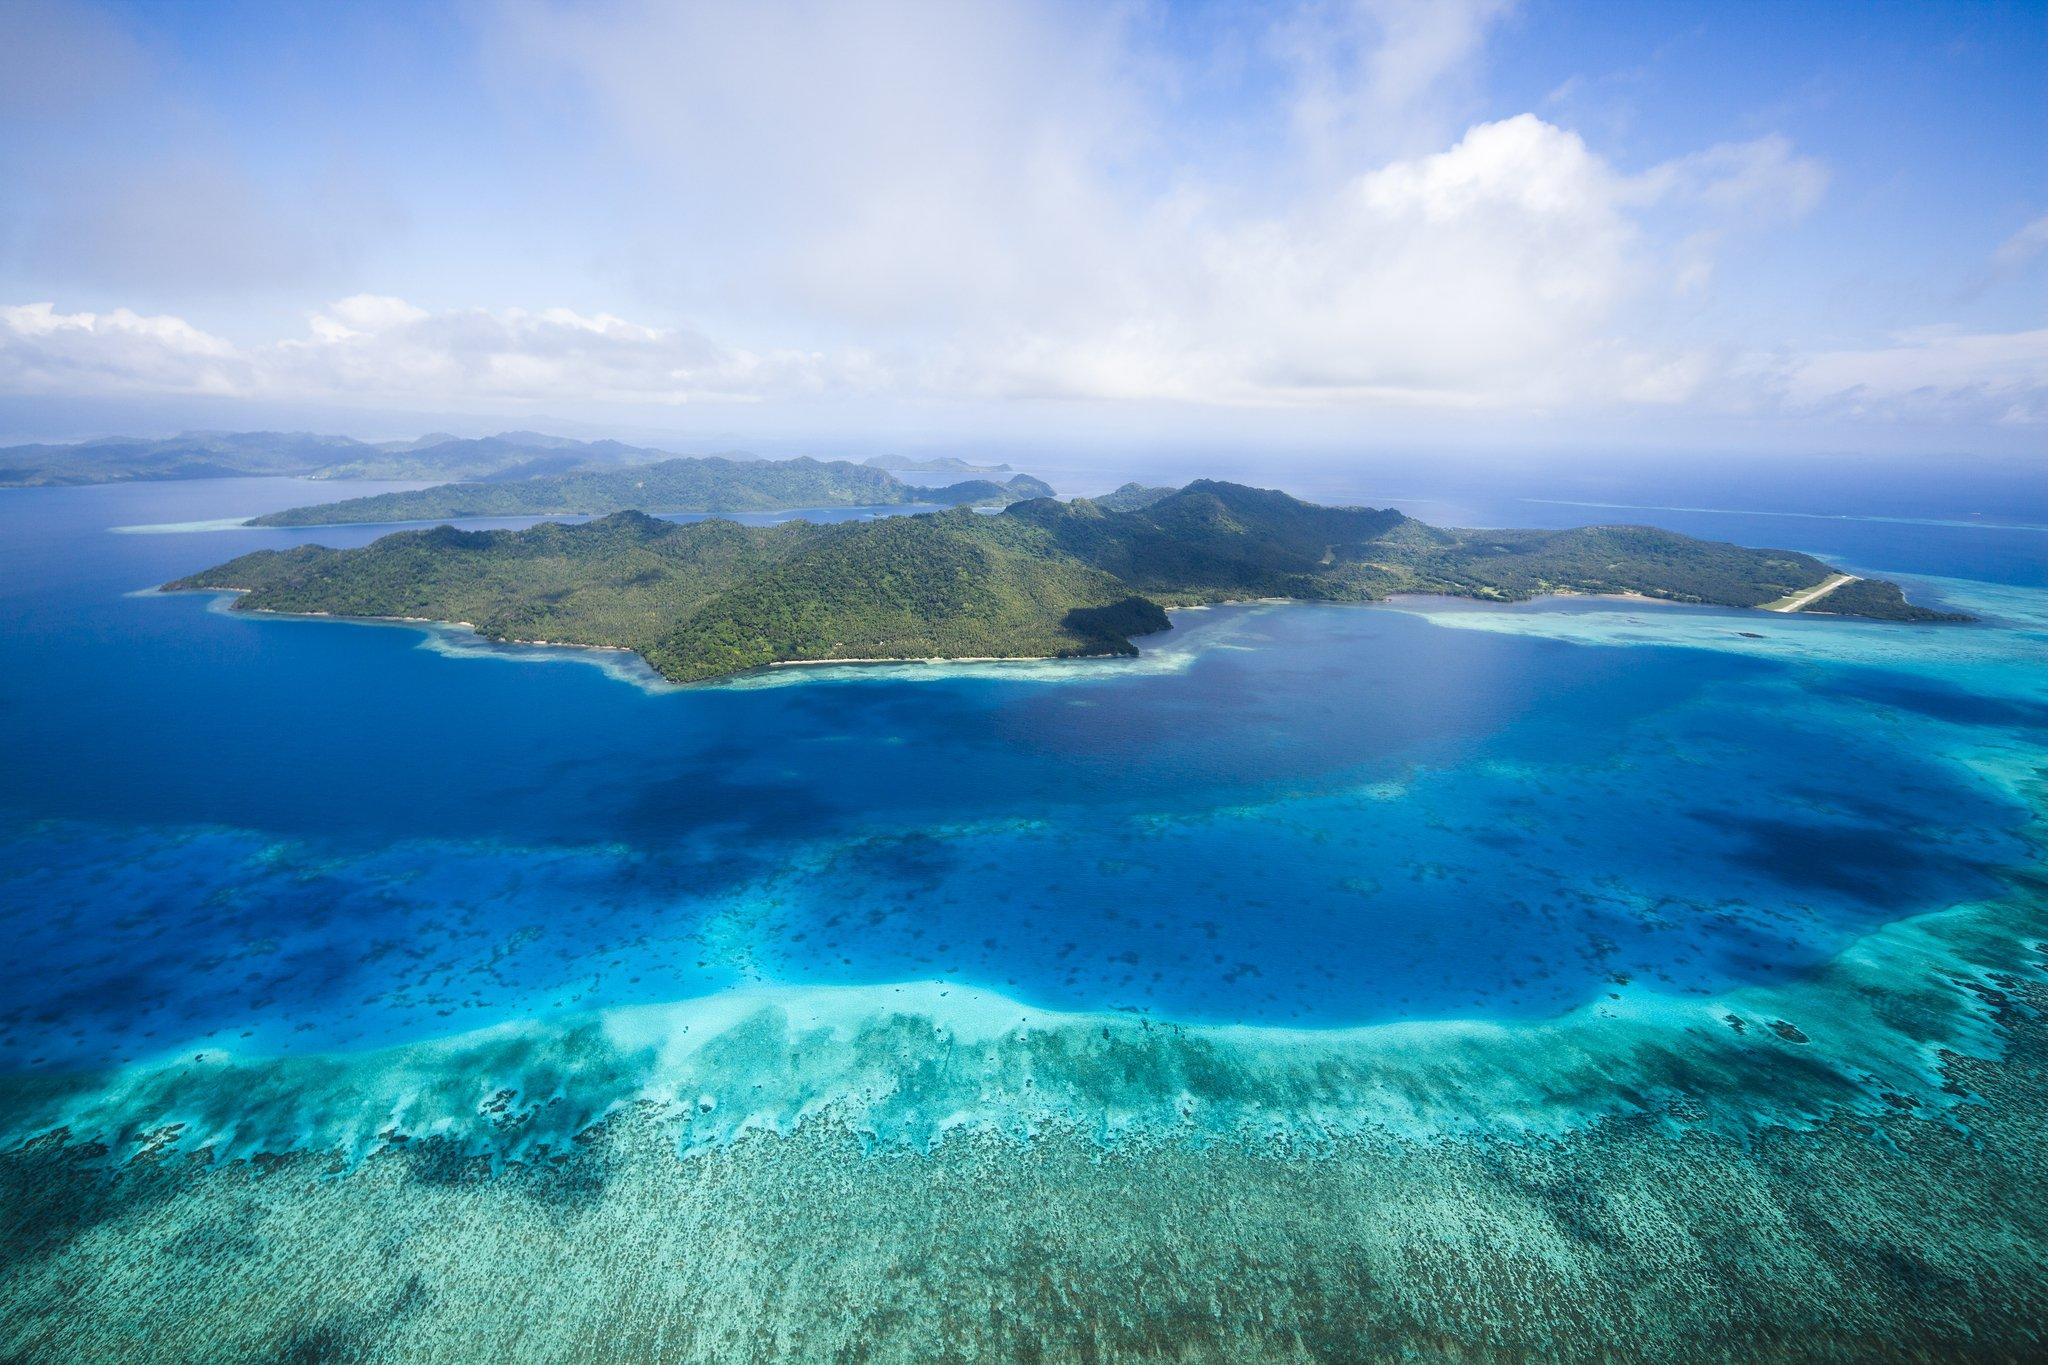 fiji-yacht-charter-7-days-1-week-route-itinerary